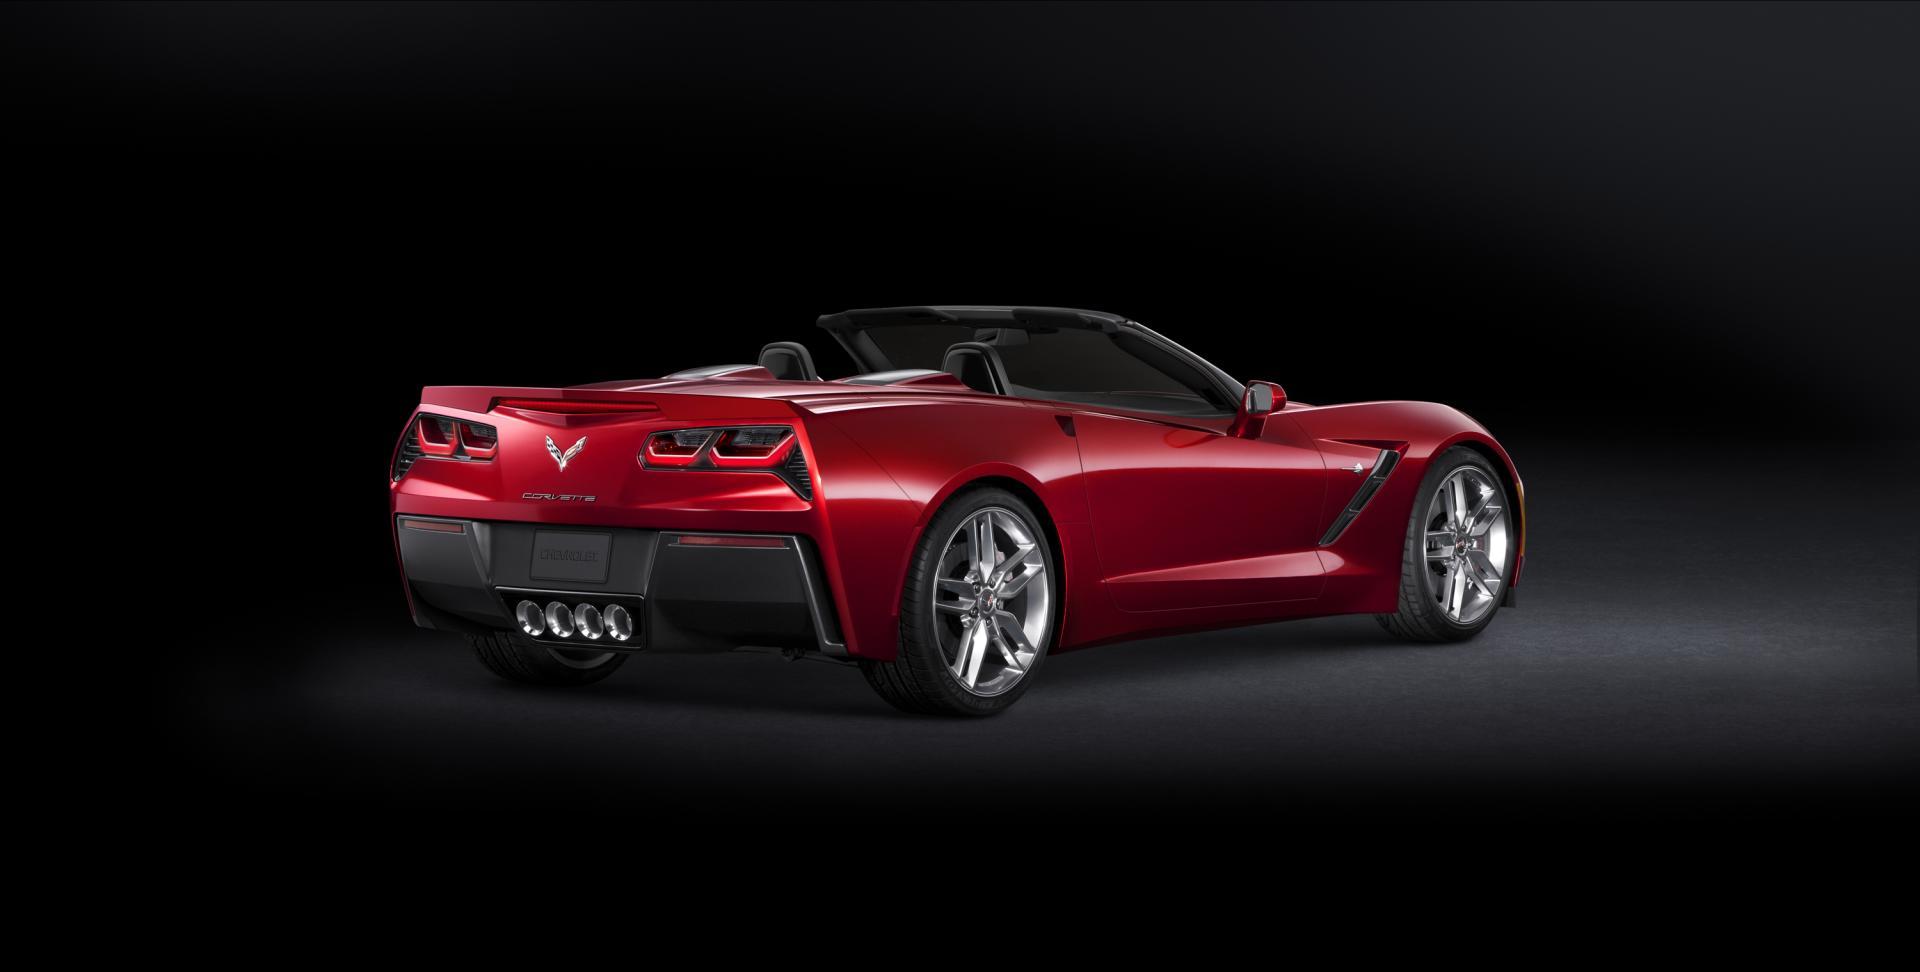 Chevrolet Corvette Stingray >> 2014 Chevrolet Corvette Stingray Convertible Image. Photo 10 of 26